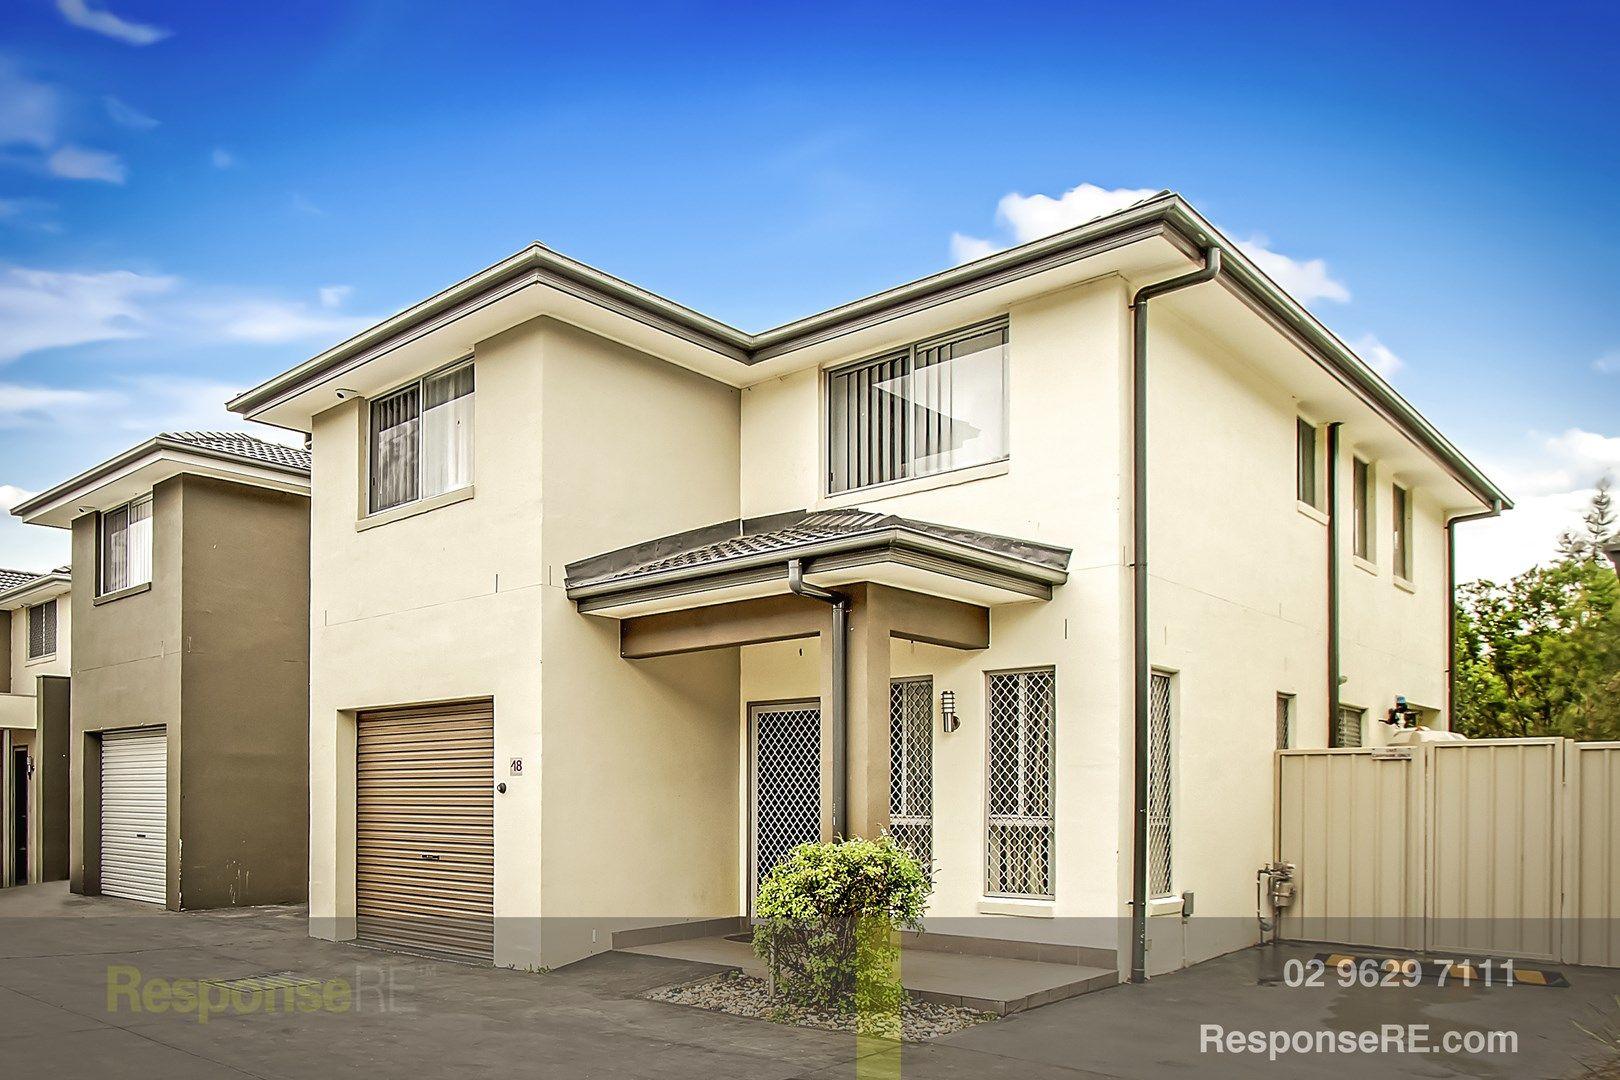 18/131 Hyatts Road, Plumpton NSW 2761, Image 0